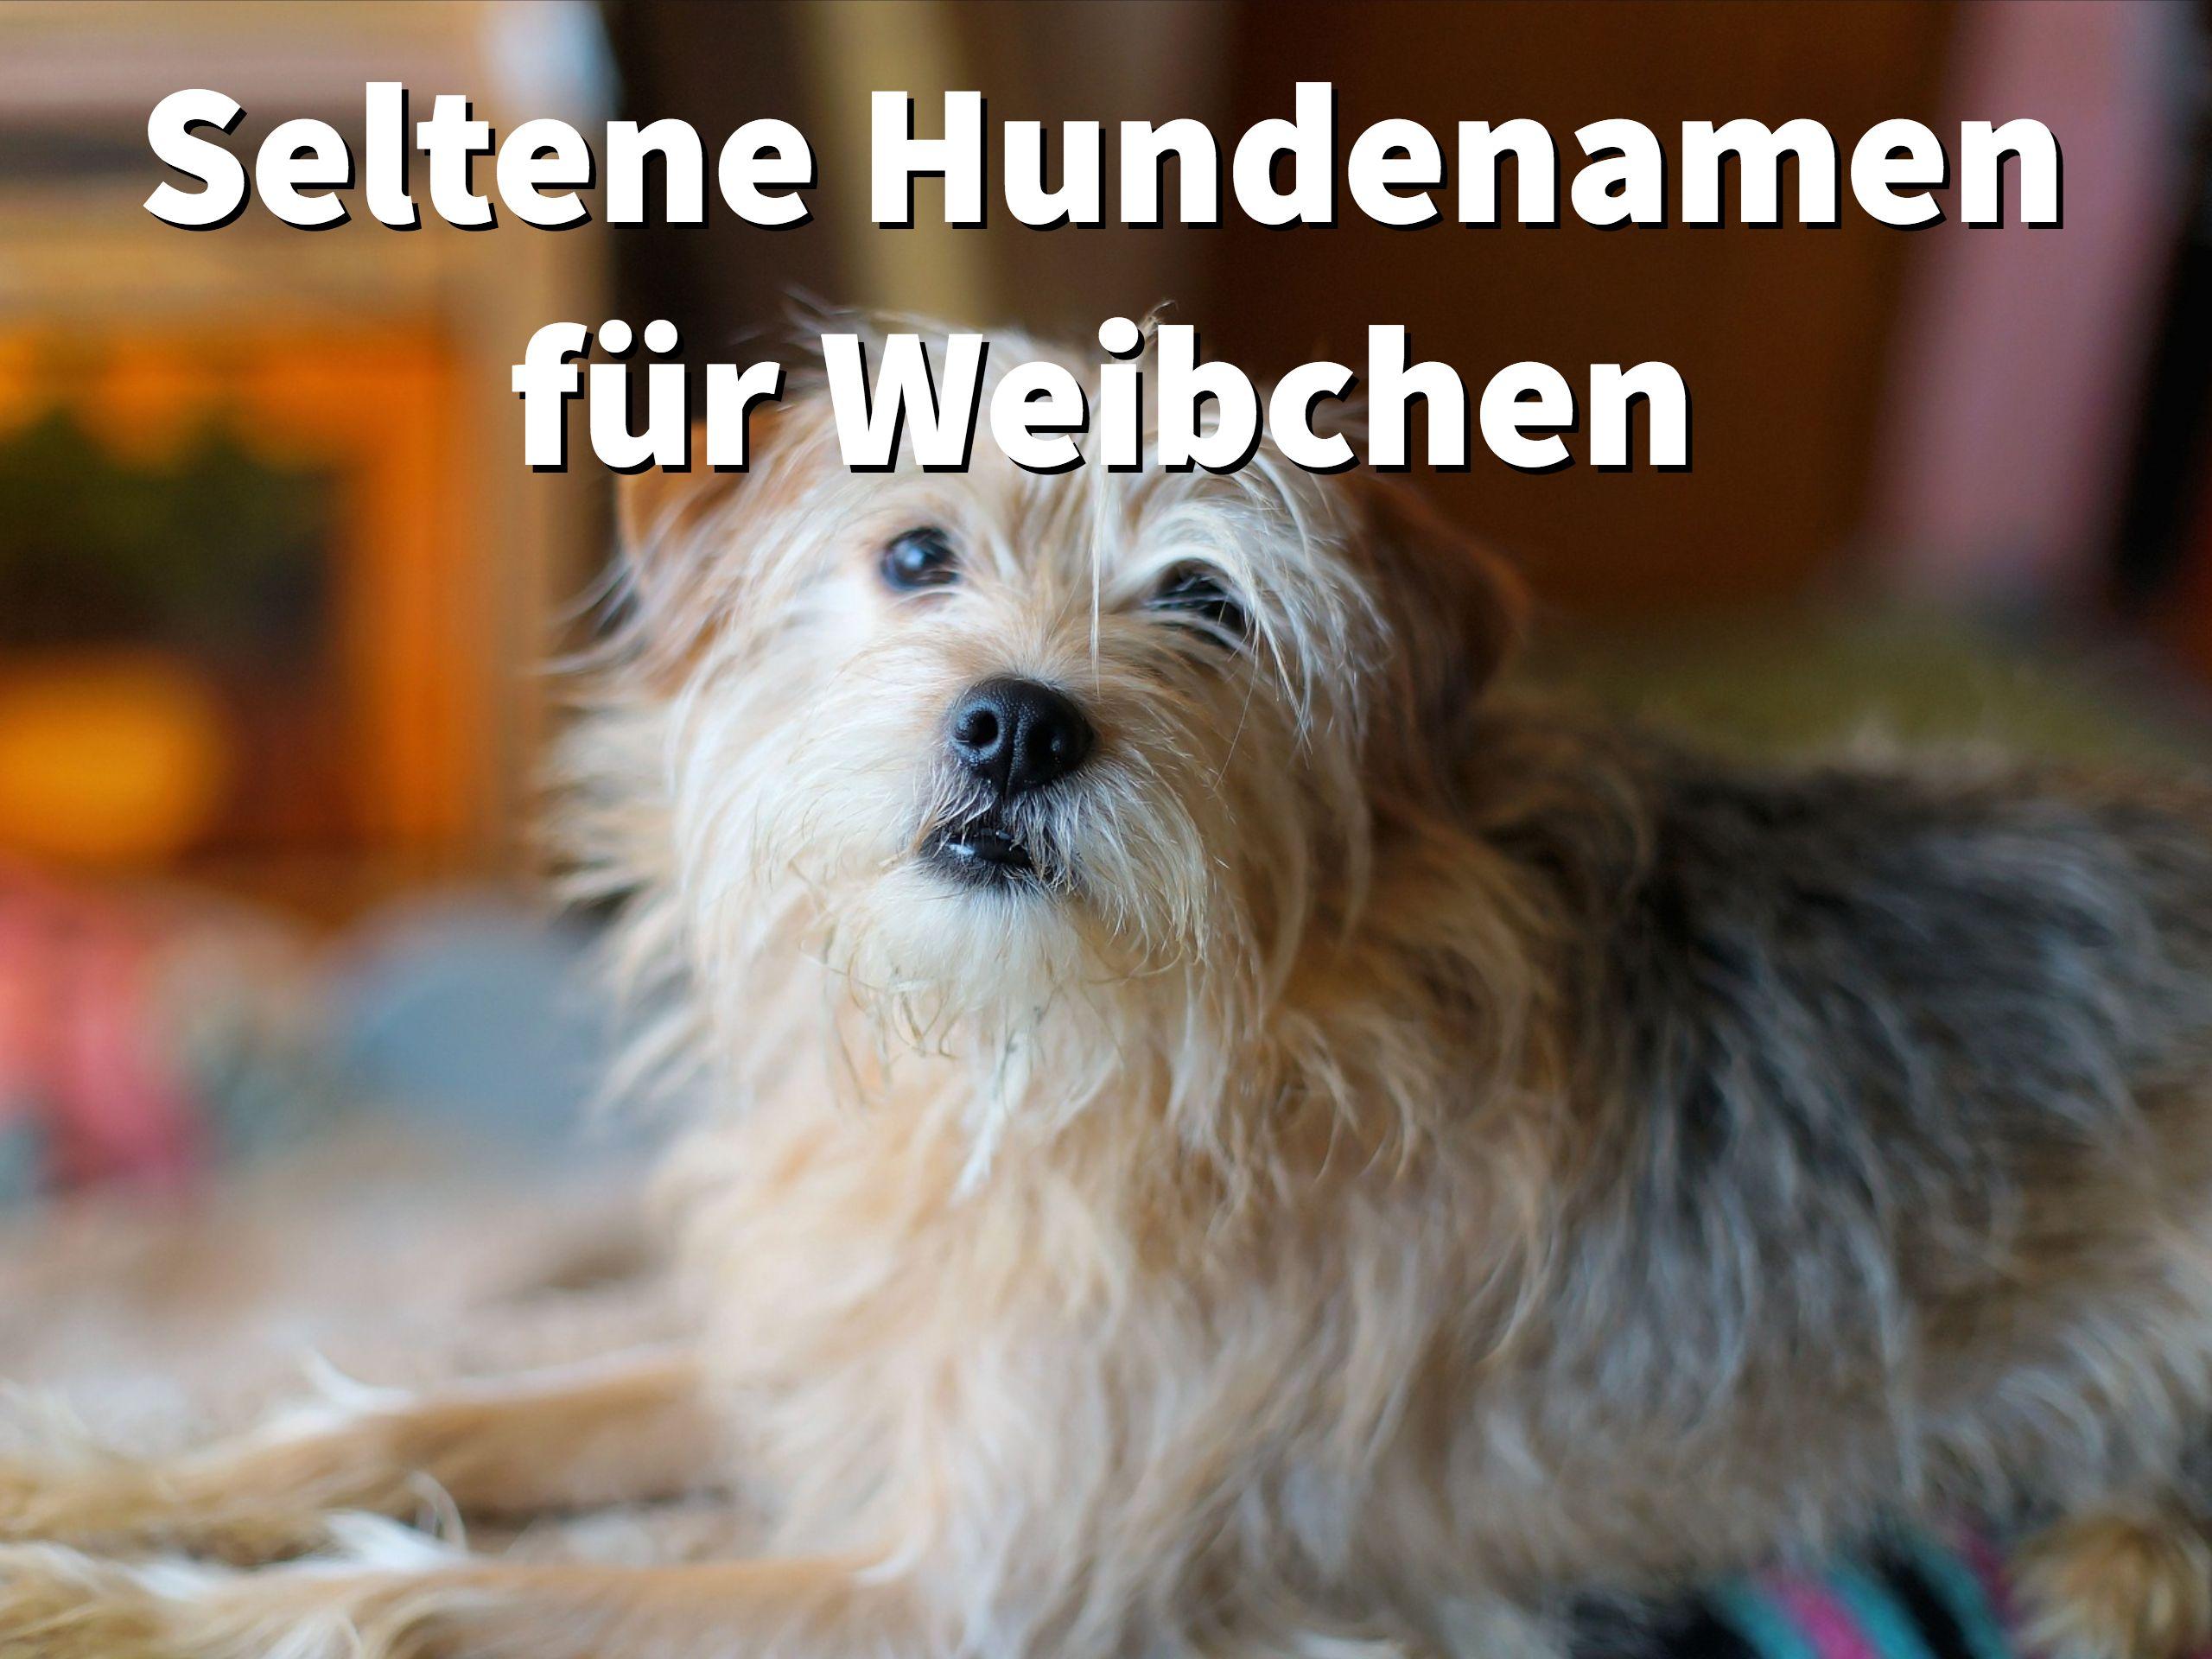 21 Seltene Hundenamen Fur Weibchen Mit Bedeutung Und Geschichte Des Namens Hundenamen Namen Fur Hunde Weibliche Hundenamen